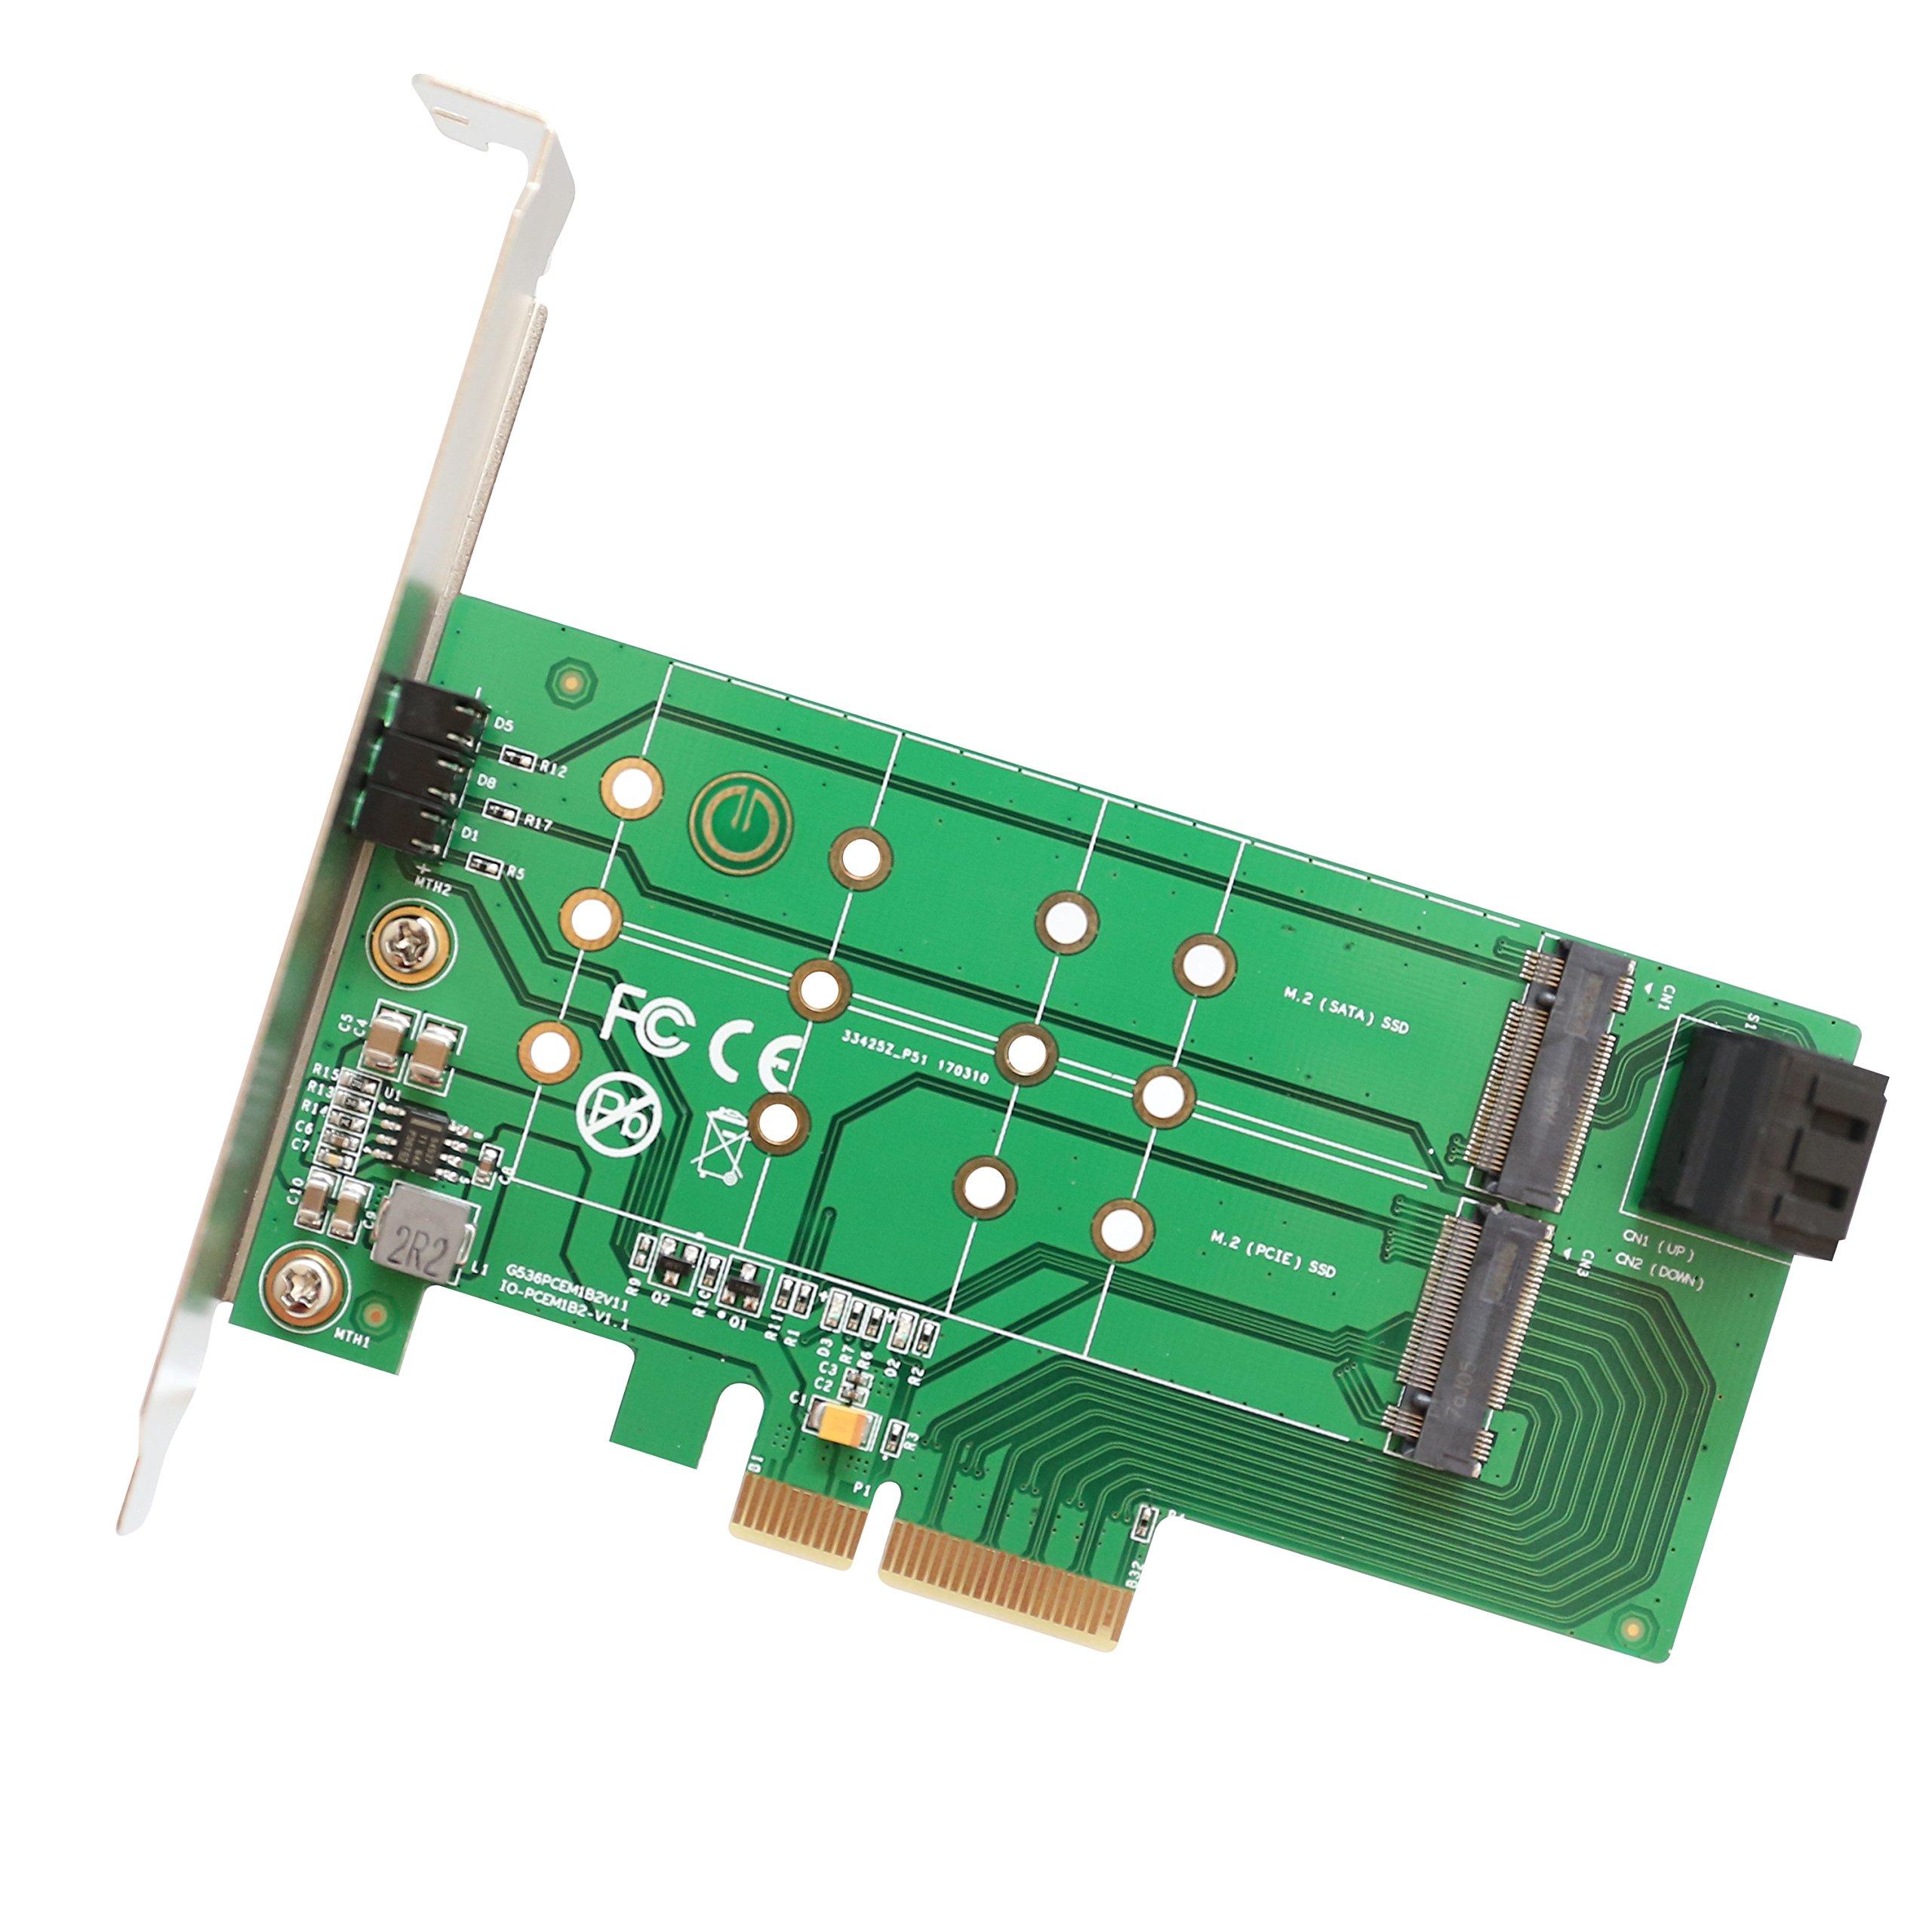 IO Crest 2 puertos M.2 B-Key y 1 puerto M.2 M-Key PCI-e x4 tarjeta adaptadora